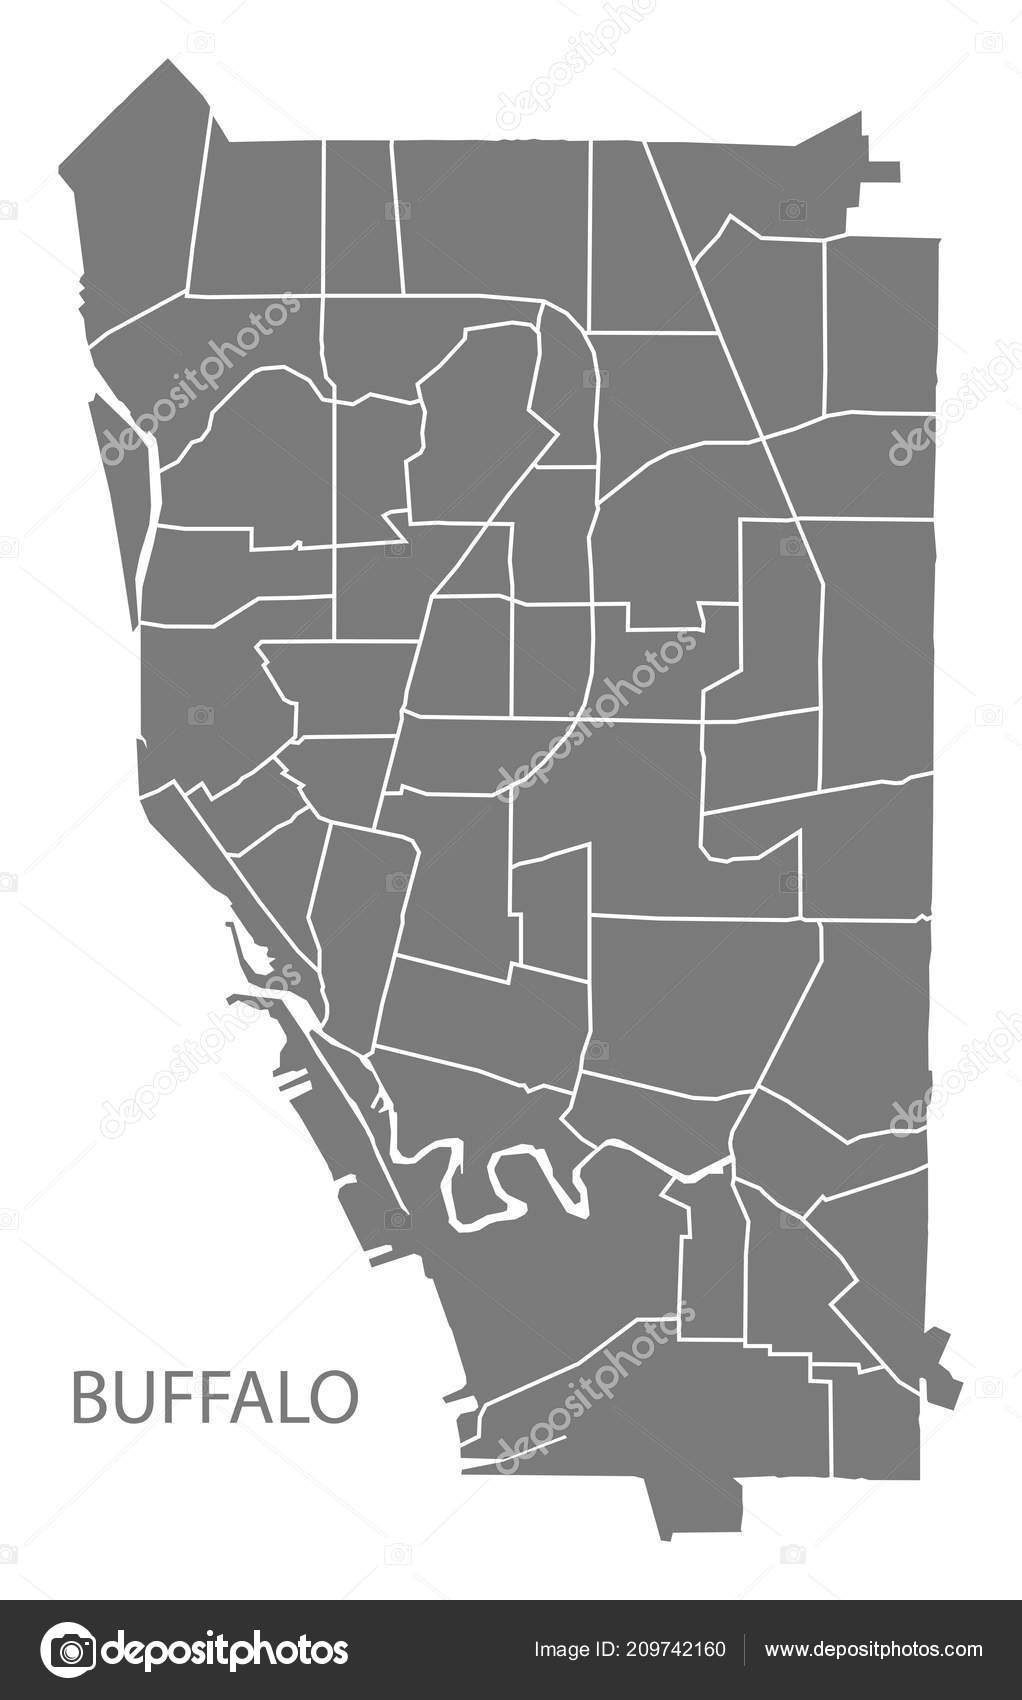 Carte Ville Buffalo.Carte Ville Buffalo New York Avec Quartiers Gris